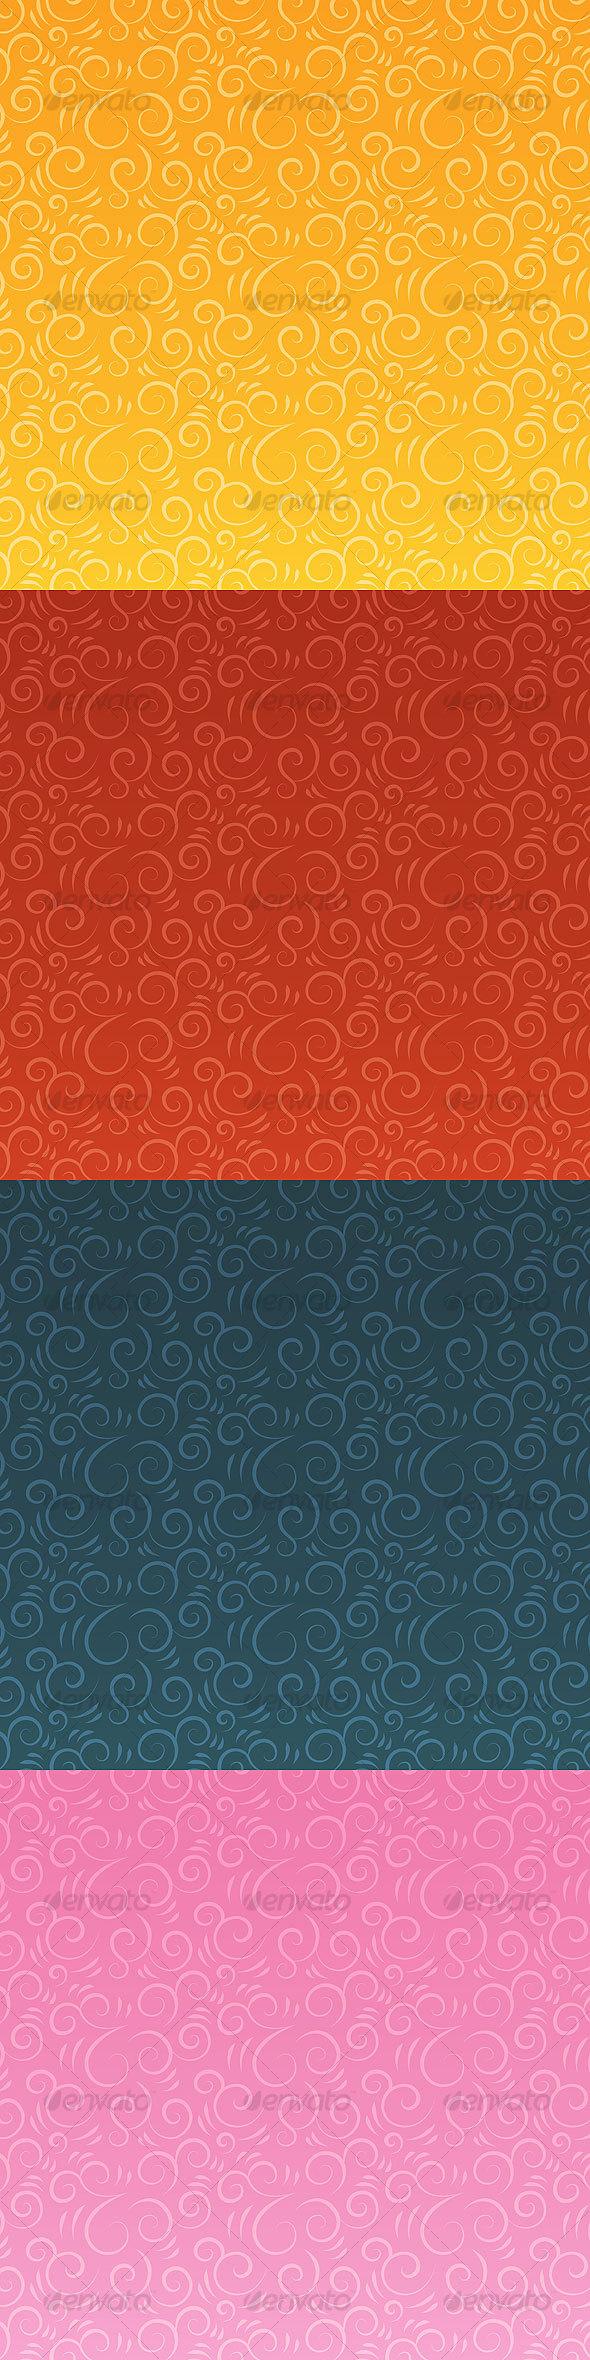 GraphicRiver Swirlush vector patterns 34569